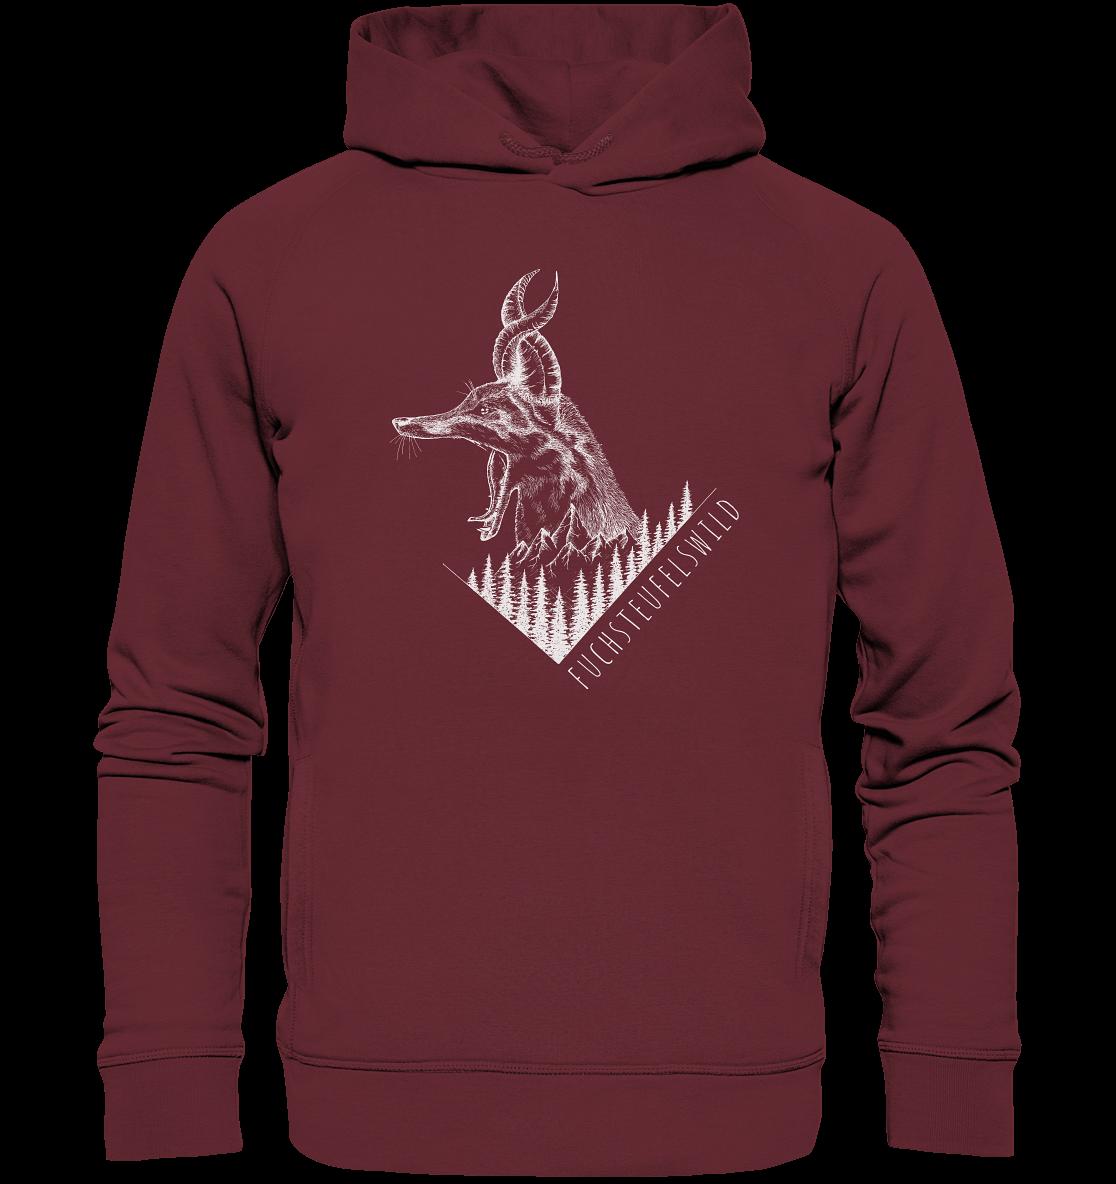 front-organic-fashion-hoodie-672b34-1116x-3.png